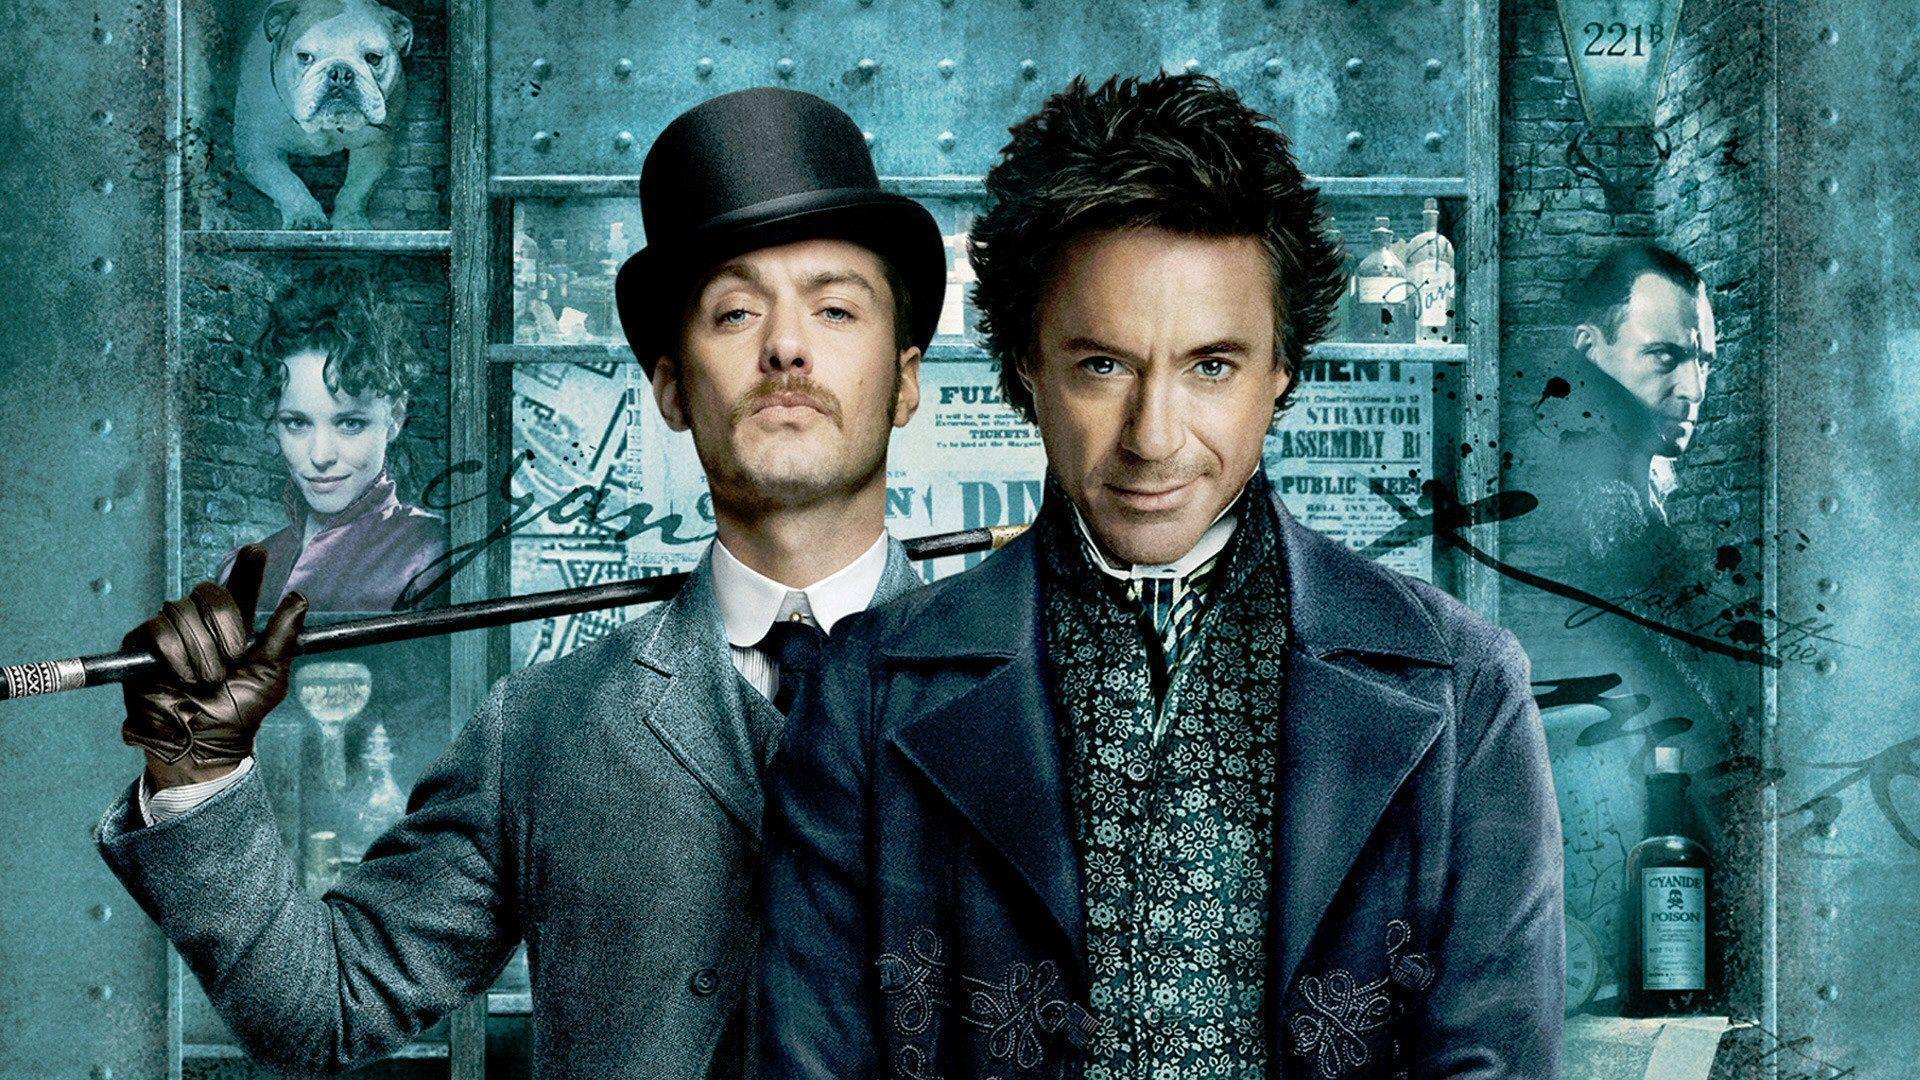 Robert Downey Jr Sherlock Holmes Wallpapers Wallpaper Cave